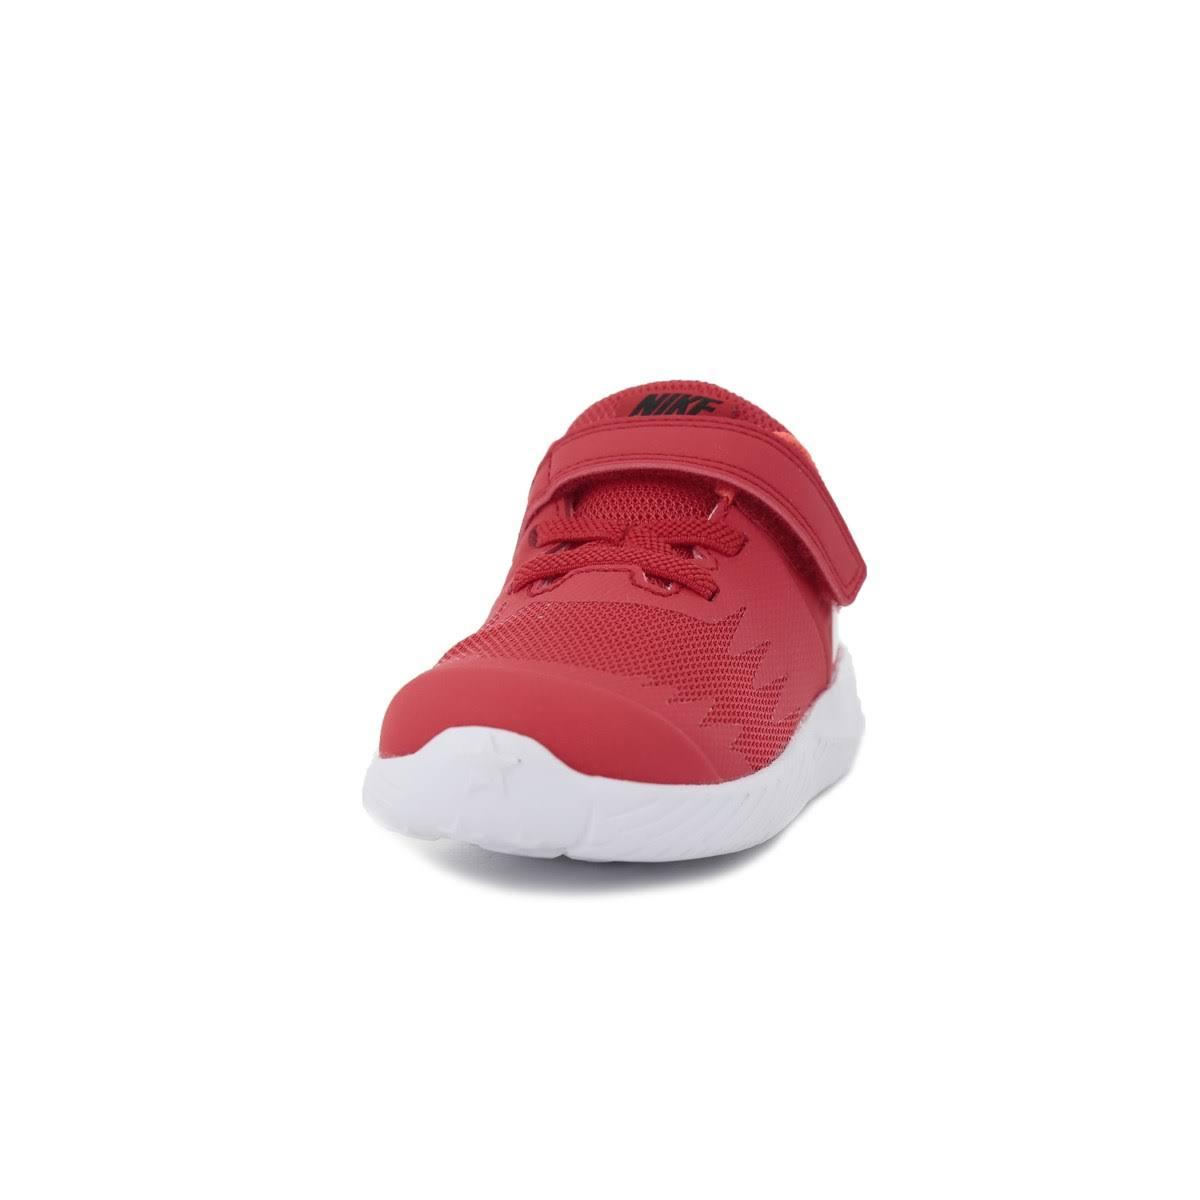 tdv 907255 Ayakkabı Nike 22 Bebek 601 Runner Spor Star PqwqxaY7E